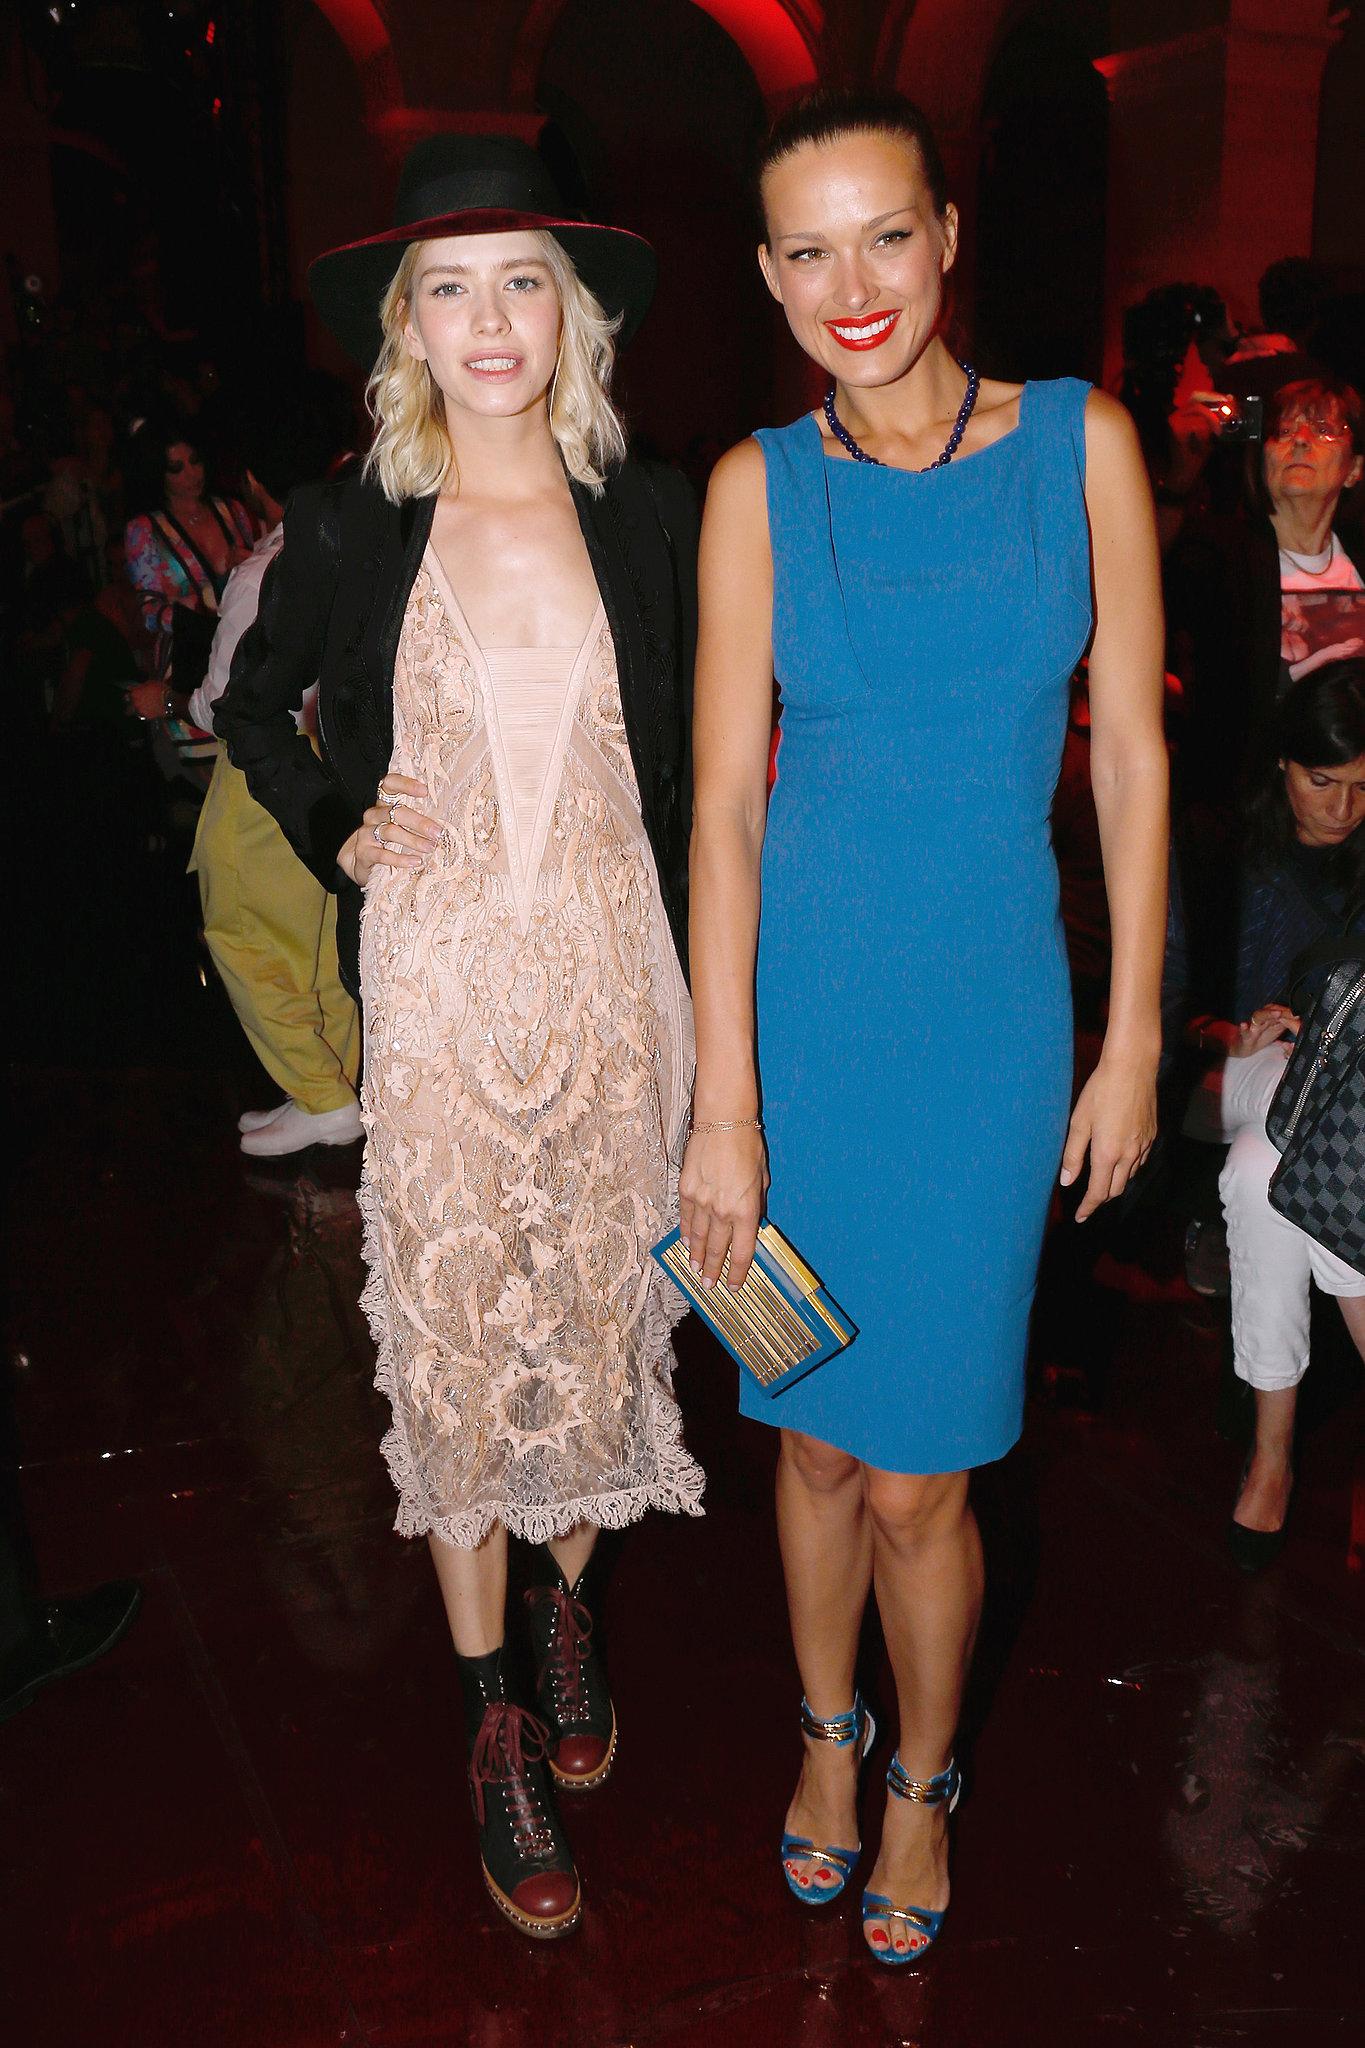 Elena Perminova and Petra Nemcova had a hot ticket to the Elie Saab Couture show.